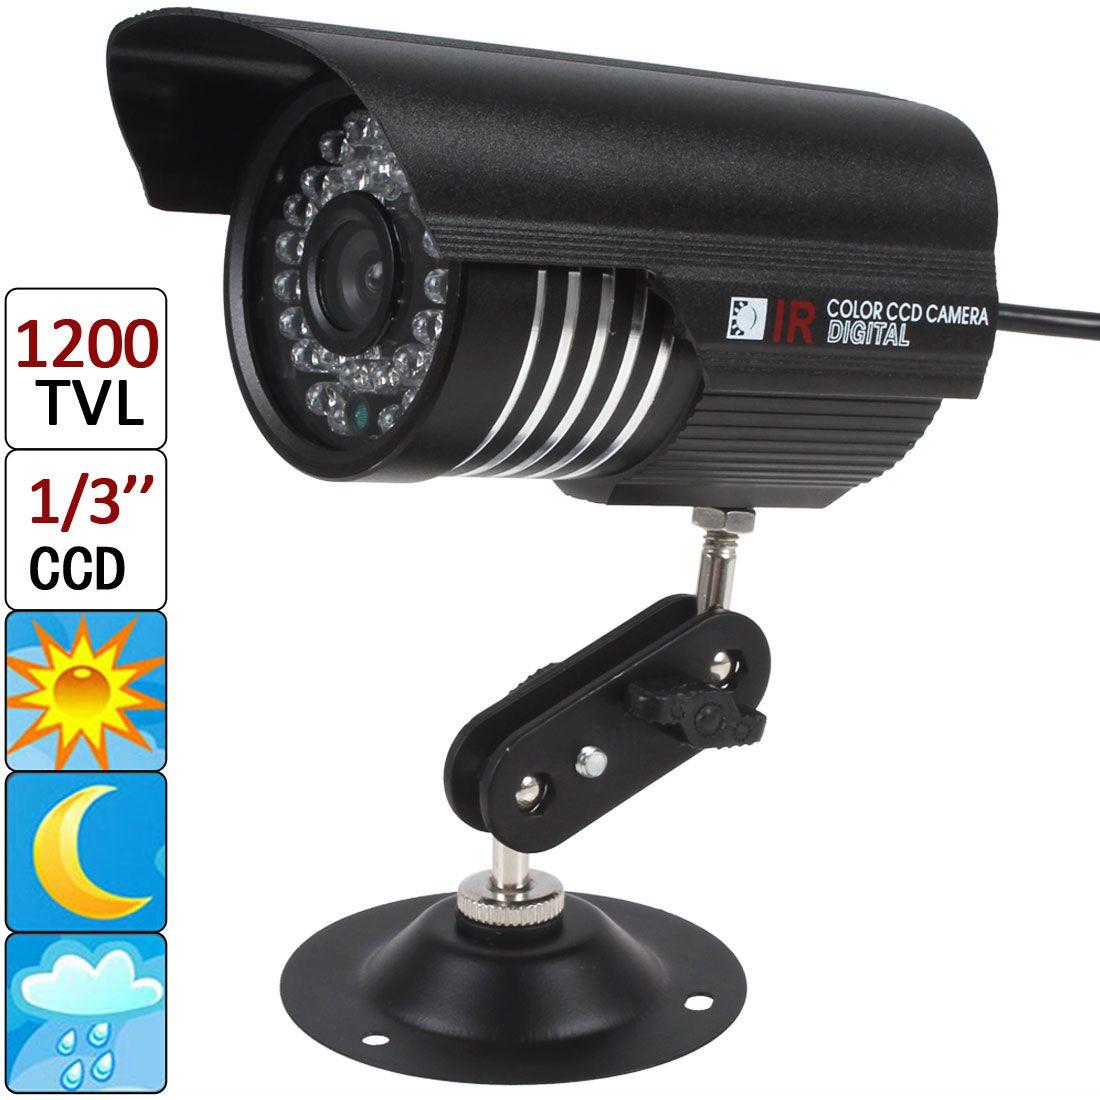 "1200 TVL 6mm Lens 36 IR LEDs IP66 Waterproof Night Vision Camera with Sony 1/3"" CCD Sensor CCT_638"